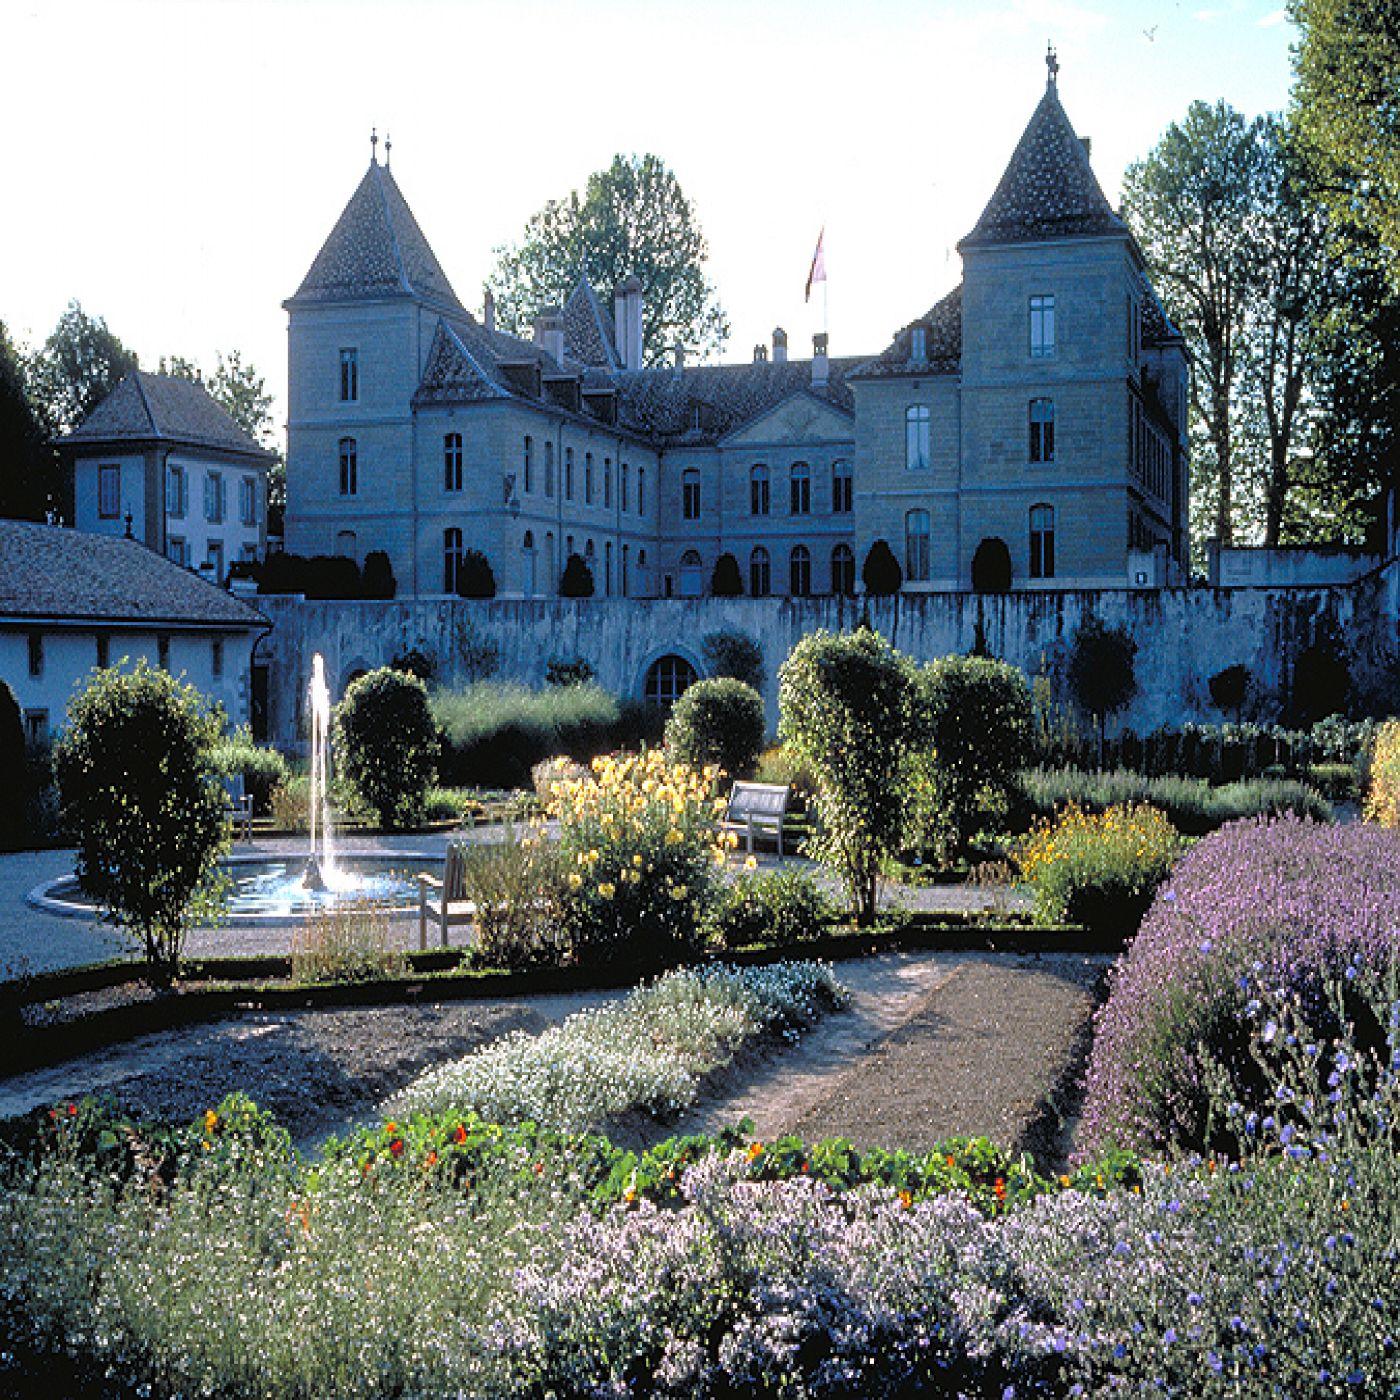 Swiss National Museum Chateau de Prangins